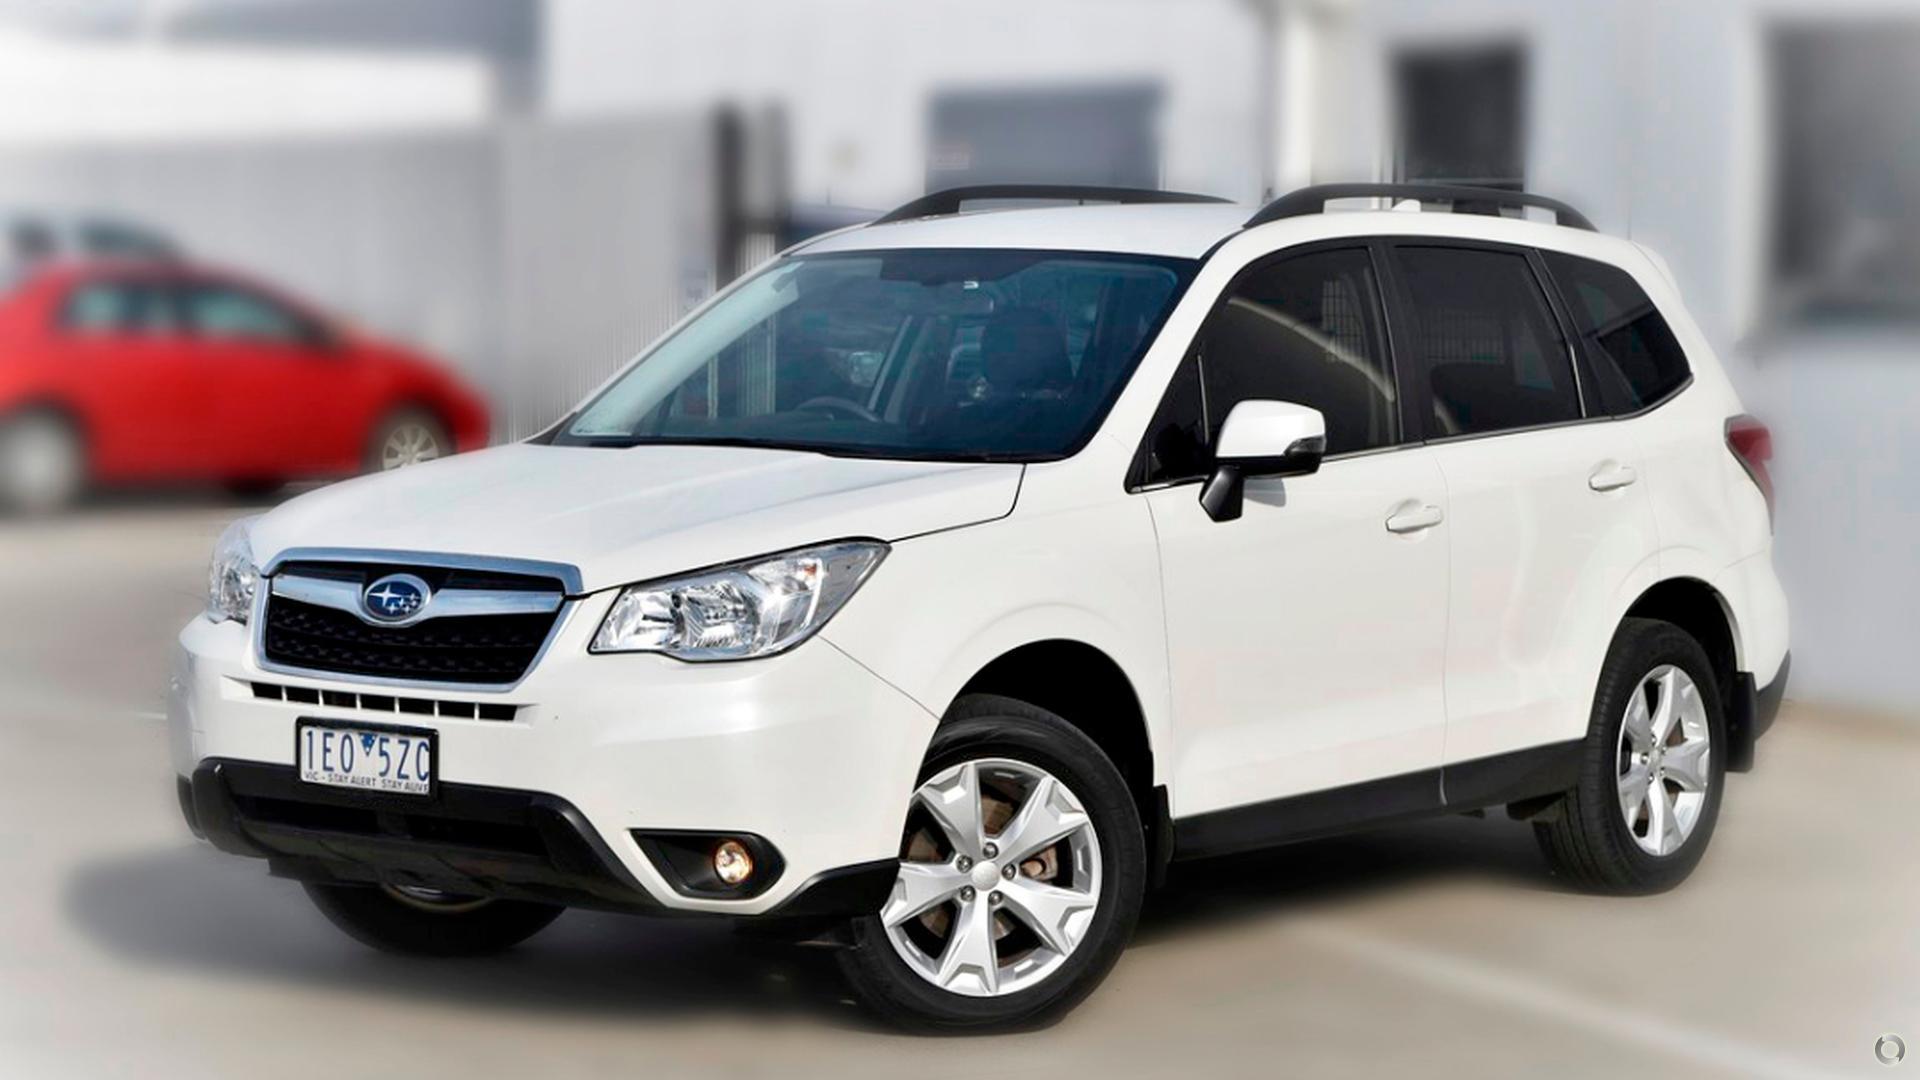 ... Body Cover Mobil Strada Triton Abu abu Source 2015 Subaru